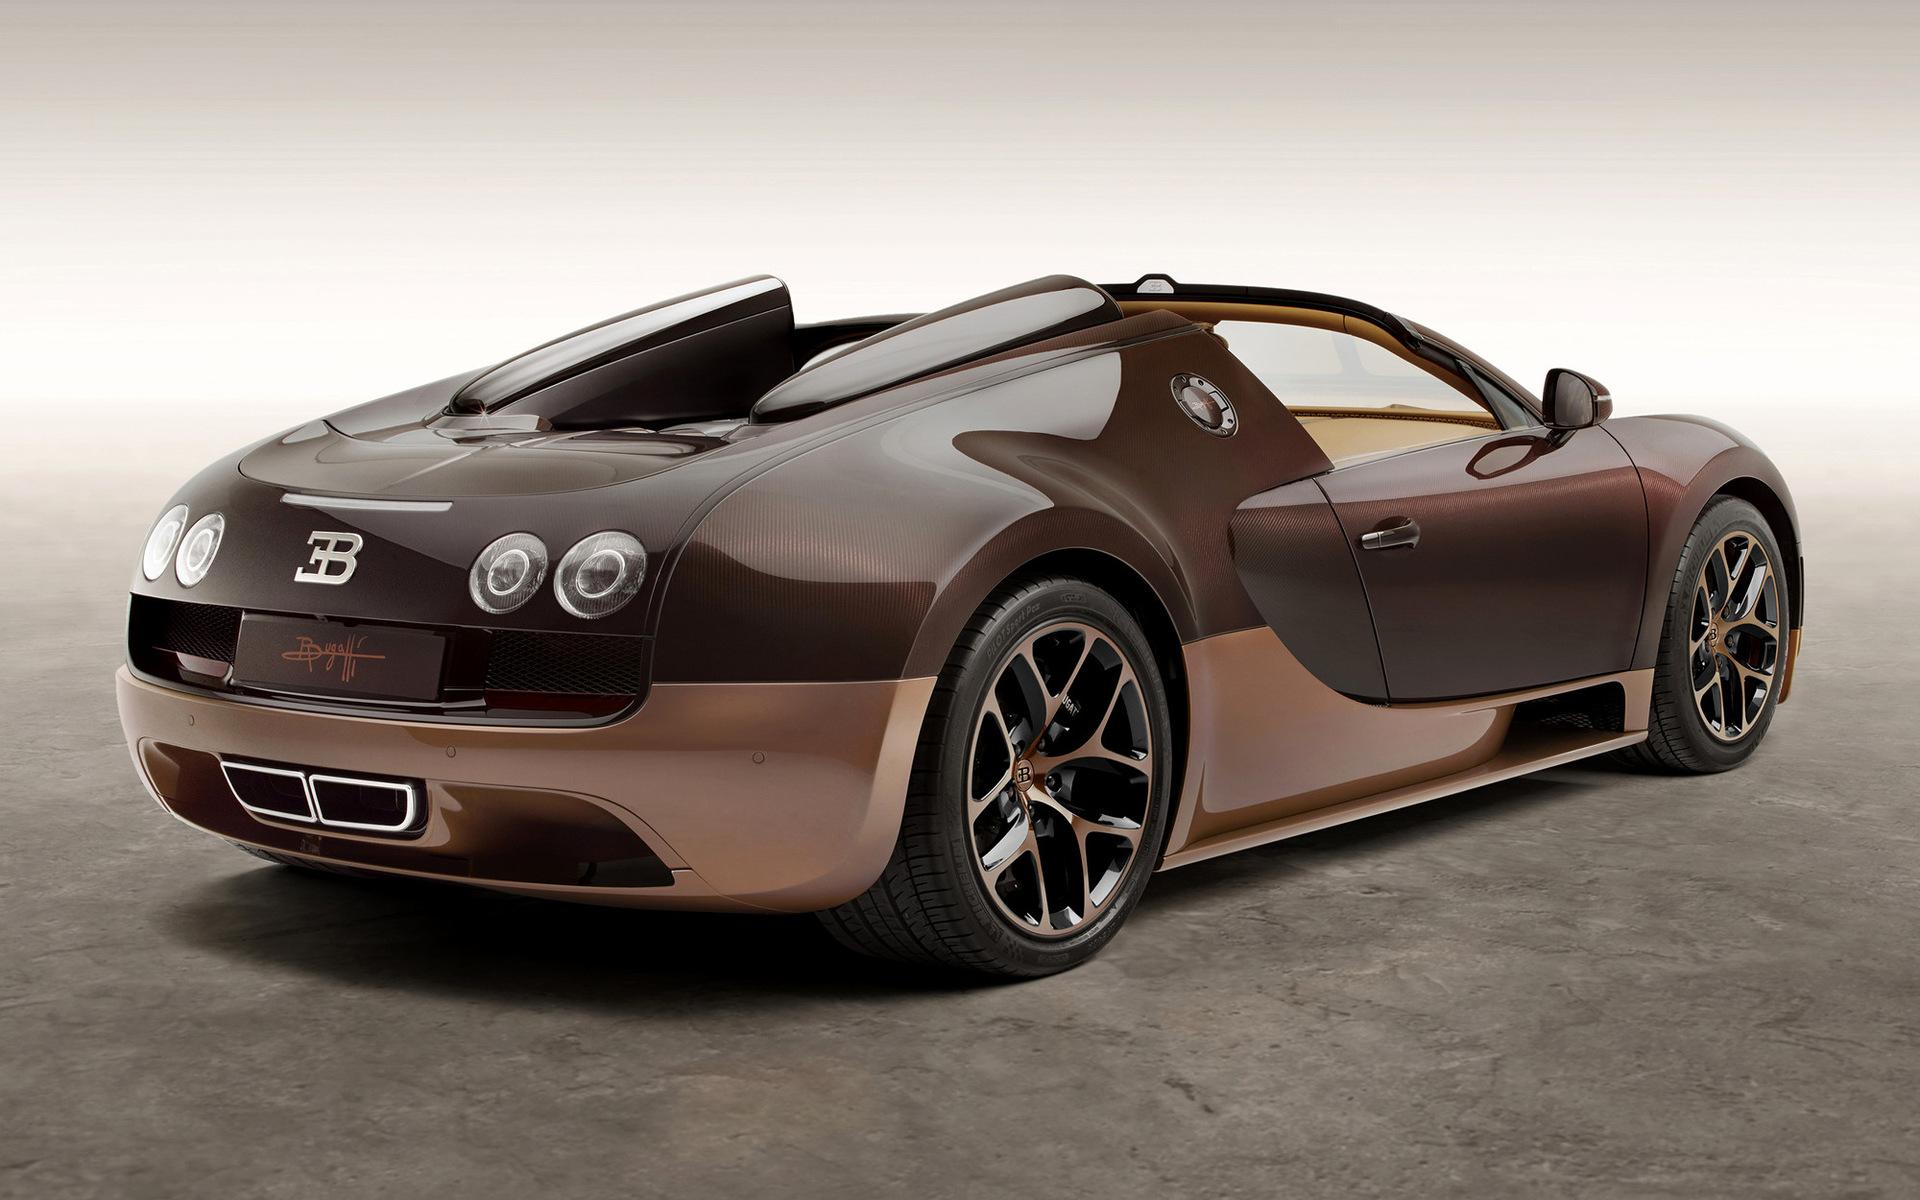 bugatti-veyron-grand-sport-vitesse-rembrandt-bugatti-car-wallpaper-9922 Inspiring Bugatti Veyron Grand Sport Vitesse Wrc Cars Trend